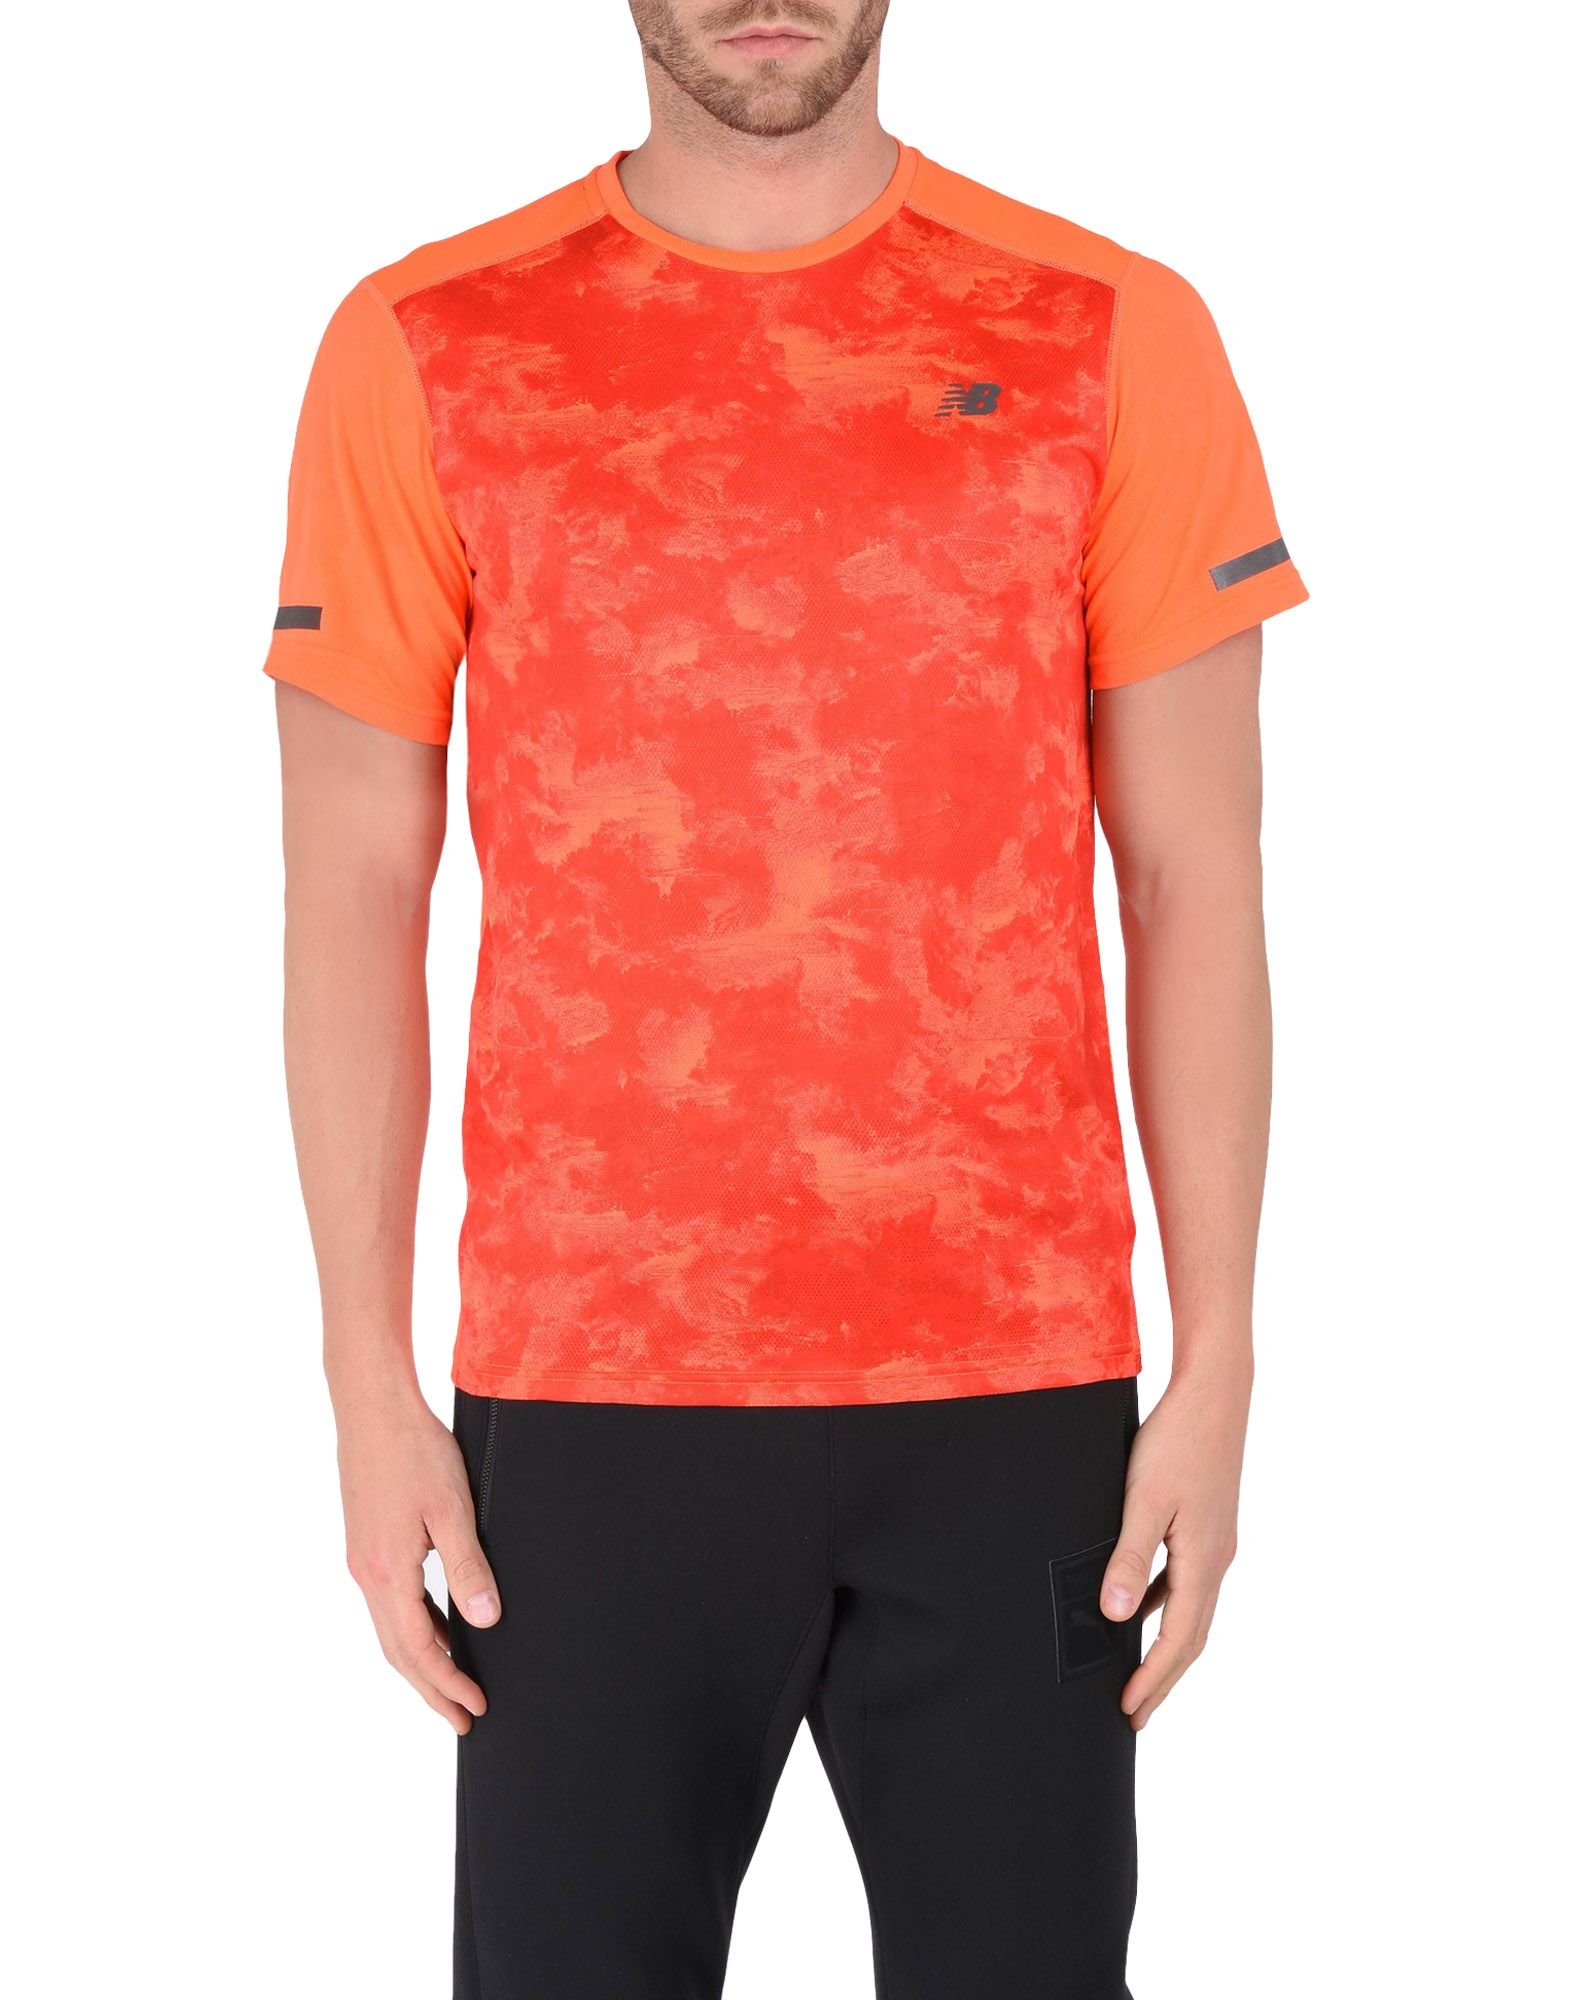 T-Shirt Nuovo Balance Intensity Max Intensity Balance Ss - Uomo - 12022014VQ 2b95ce